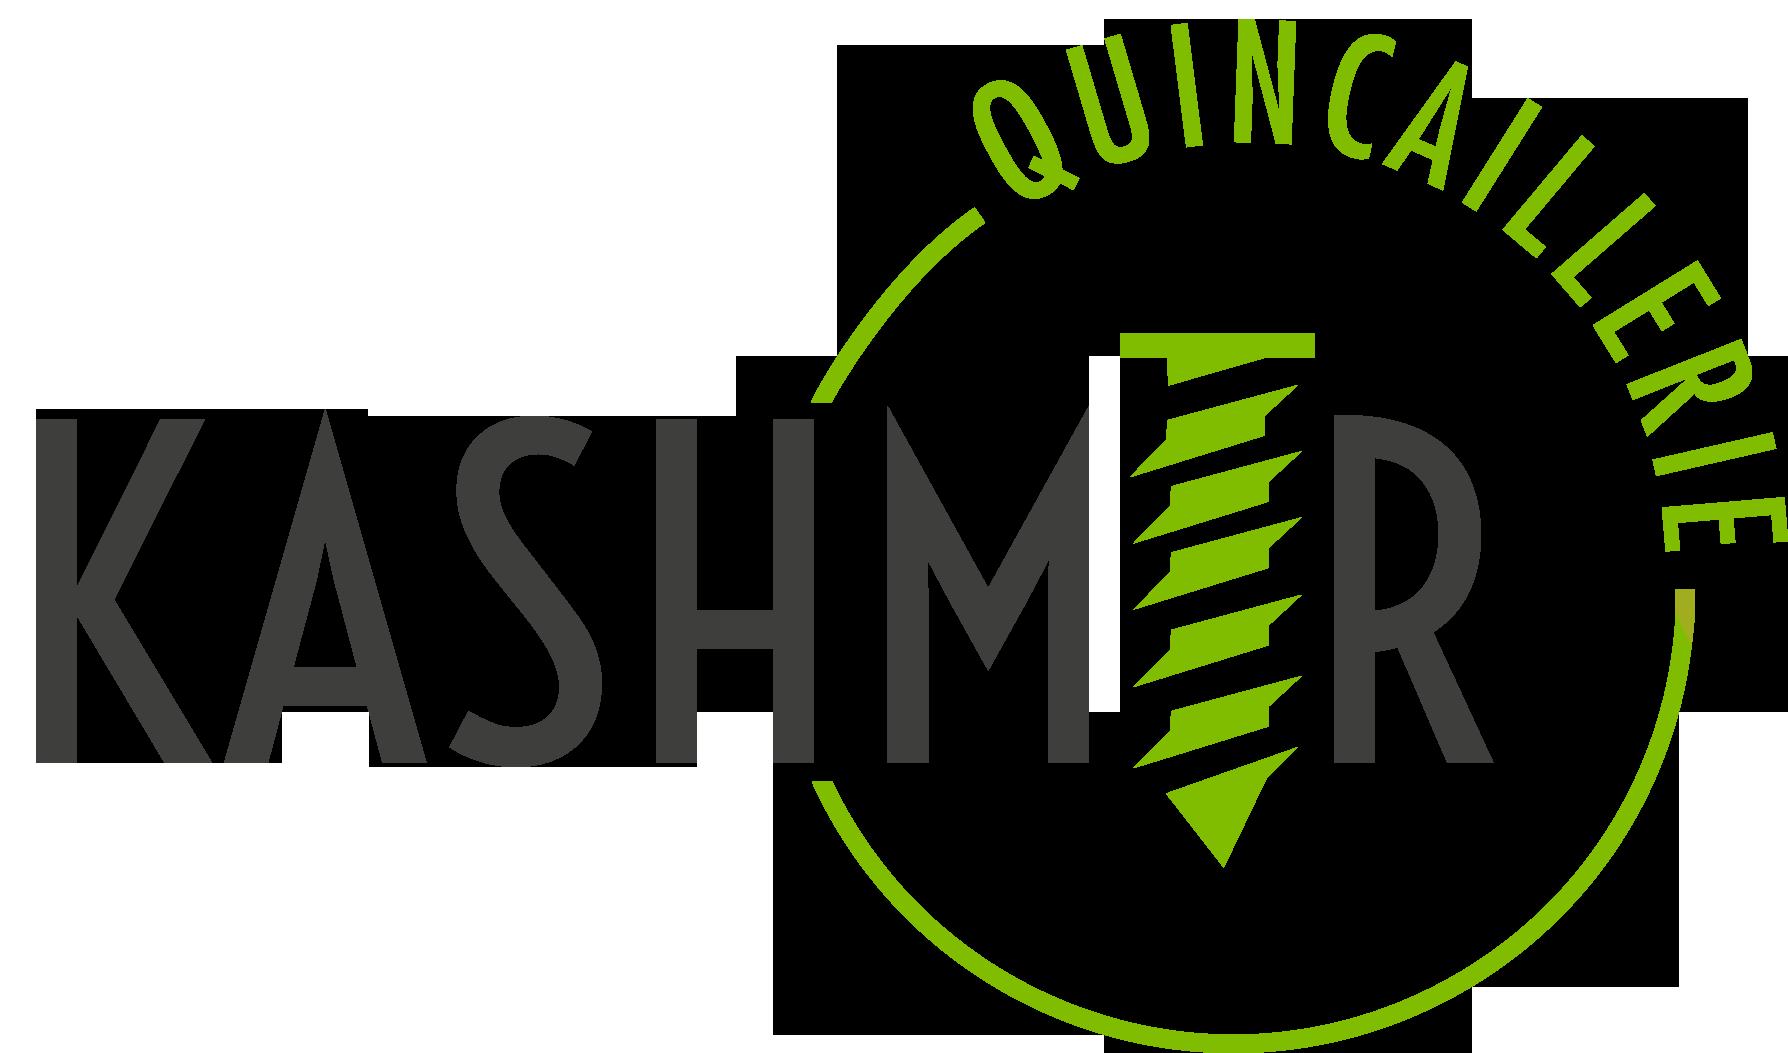 Quincaillerie Kashmir